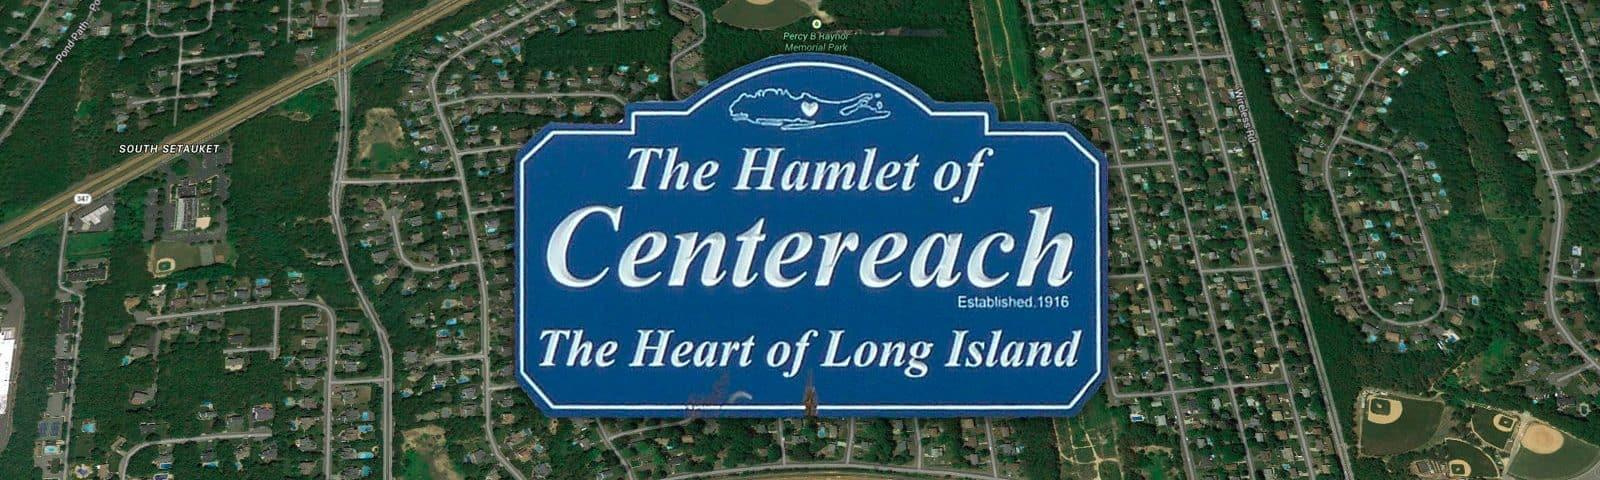 centereach